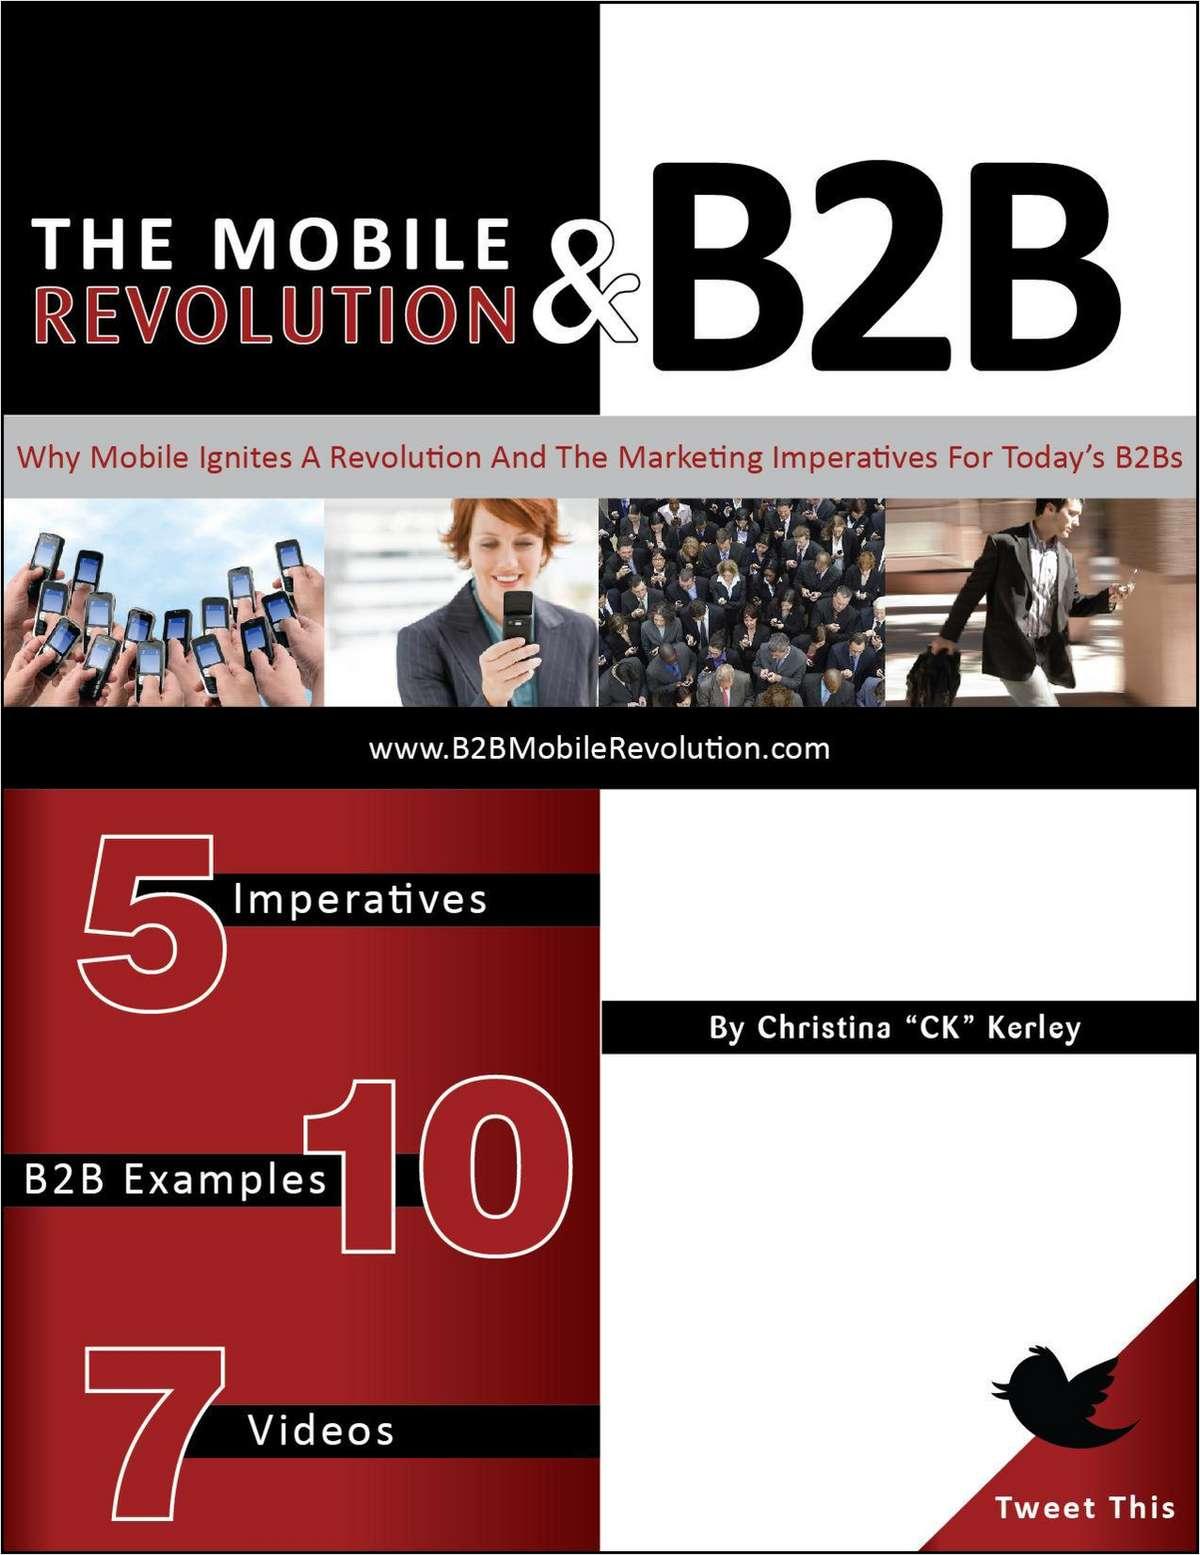 The Mobile Revolution & B2B